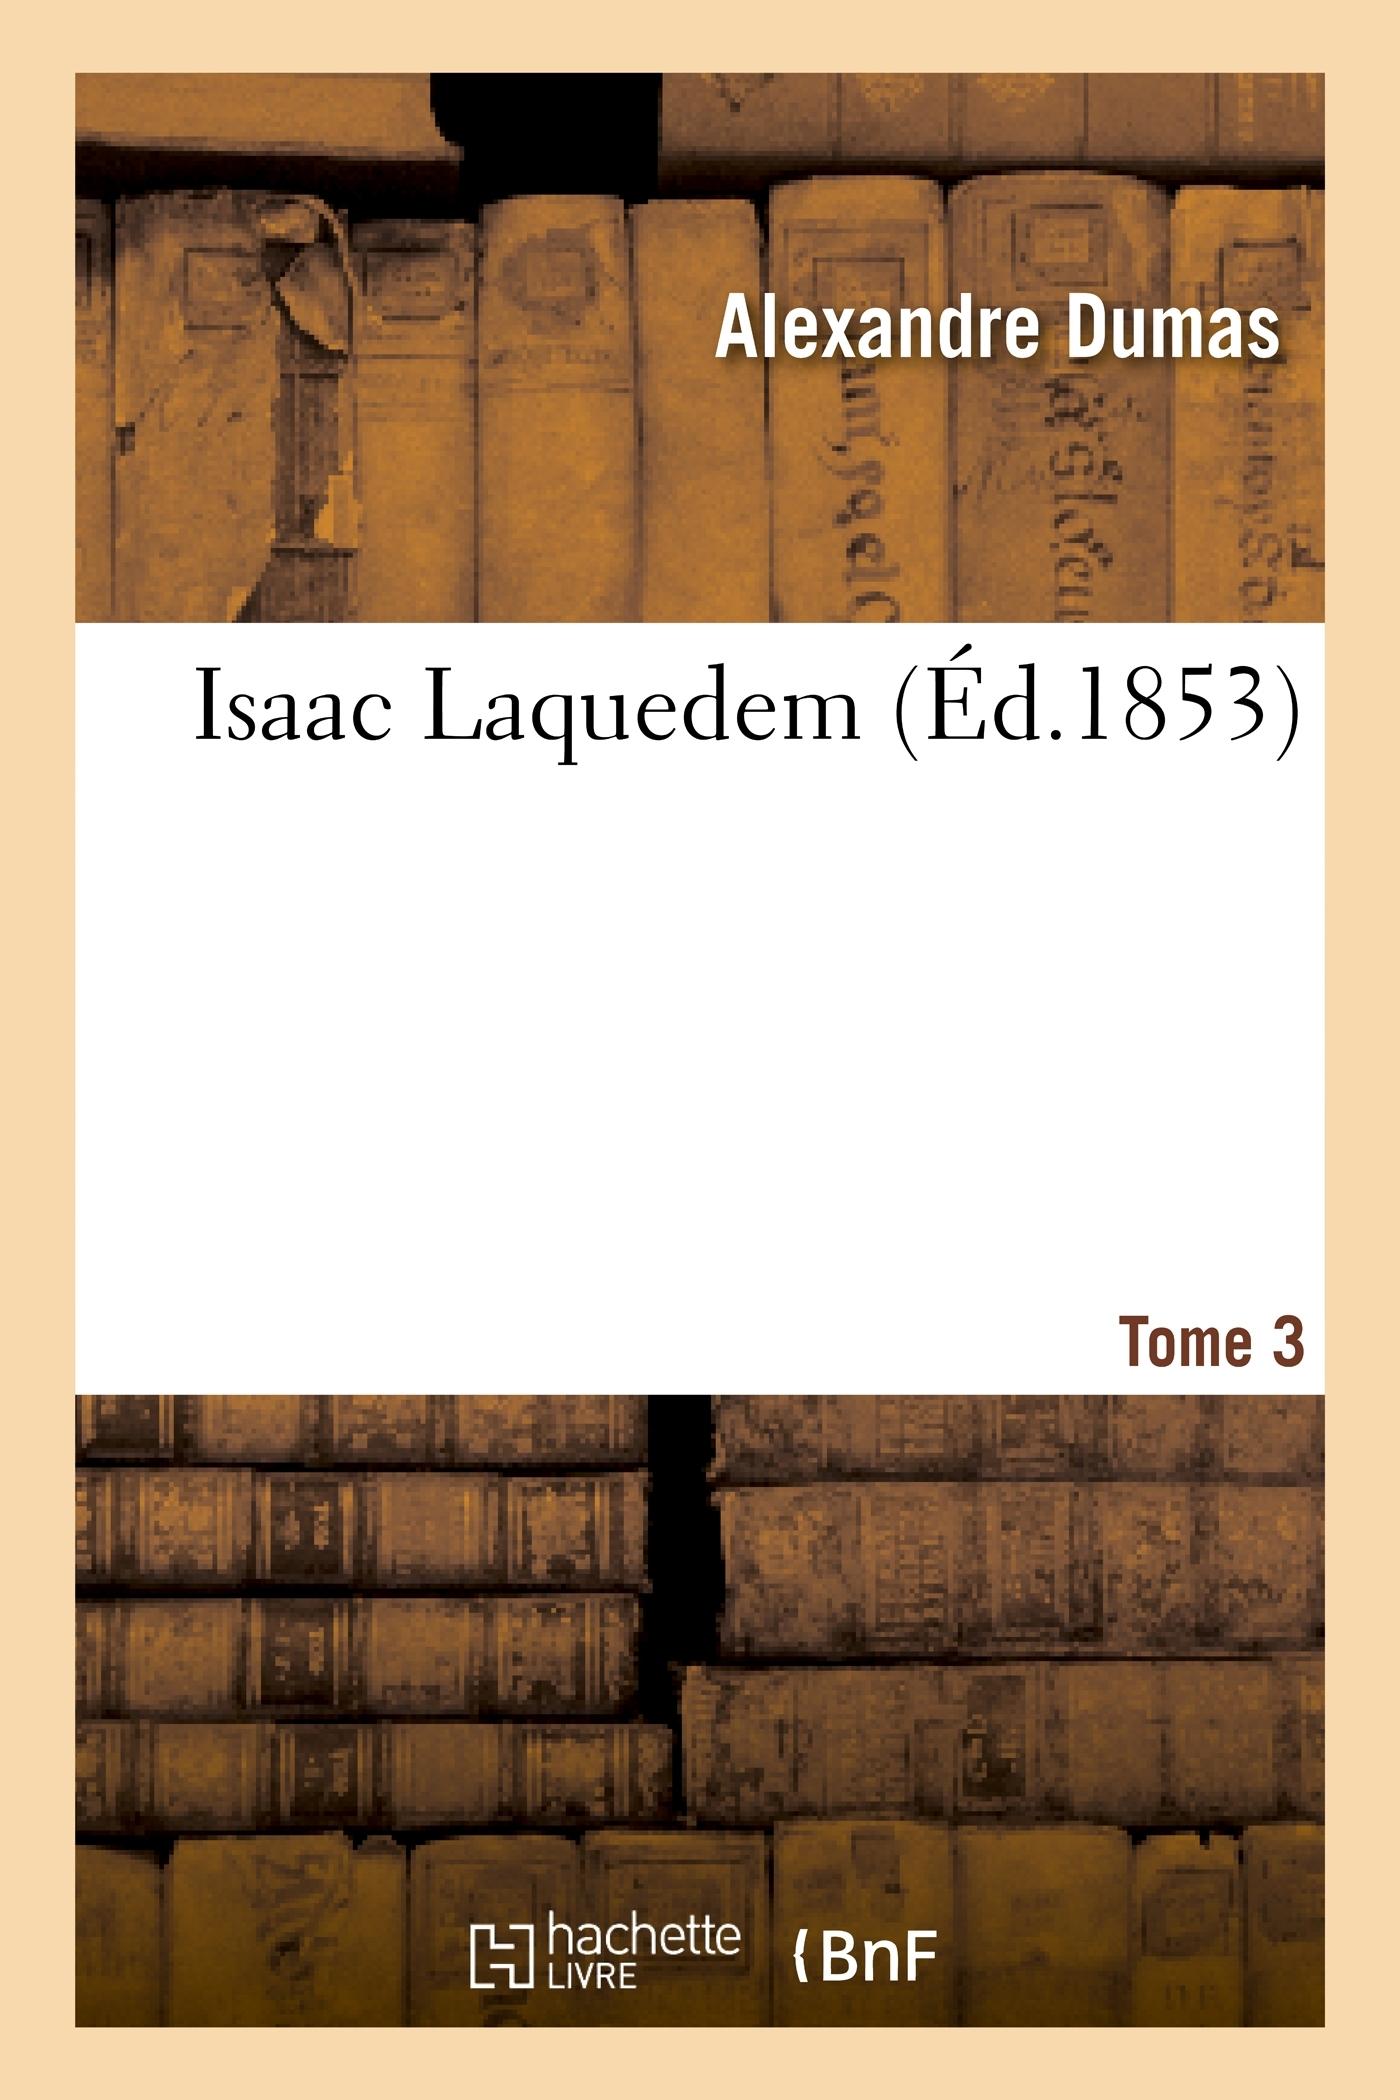 ISAAC LAQUEDEM. T. 3